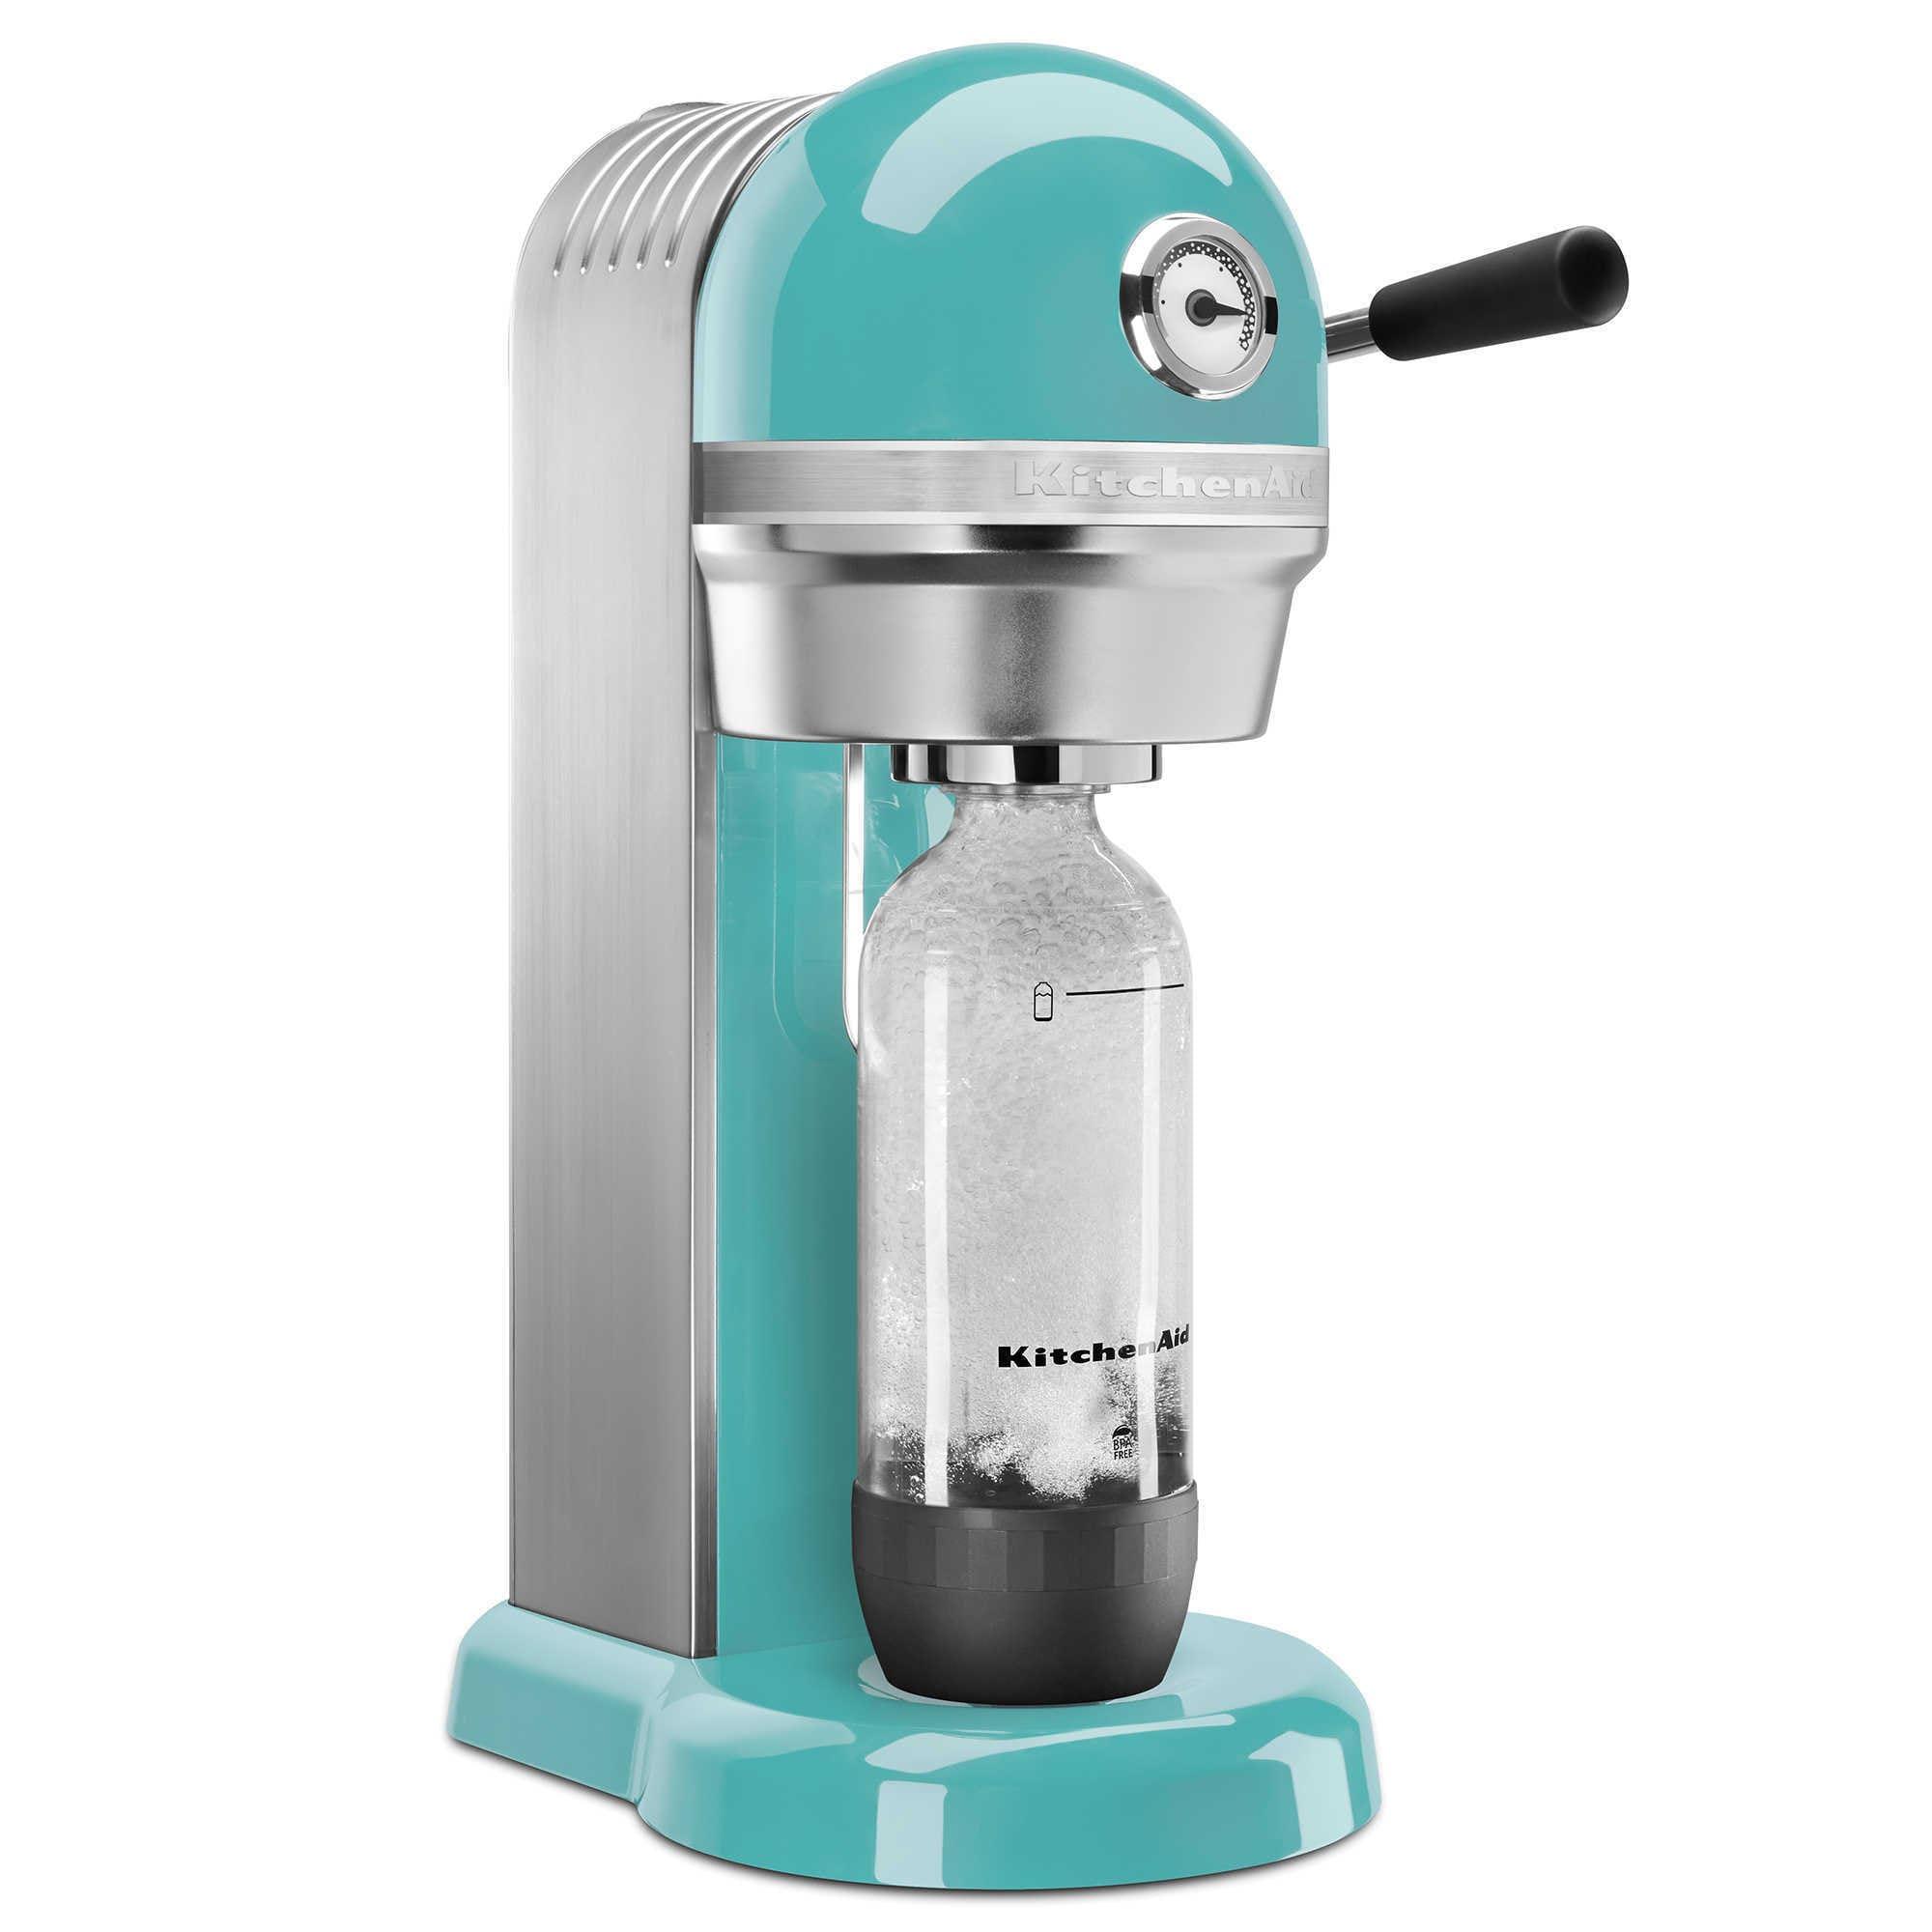 Shop KitchenAid KSS1121AQ Aqua Sky Sparkling Beverage Maker - Free ...